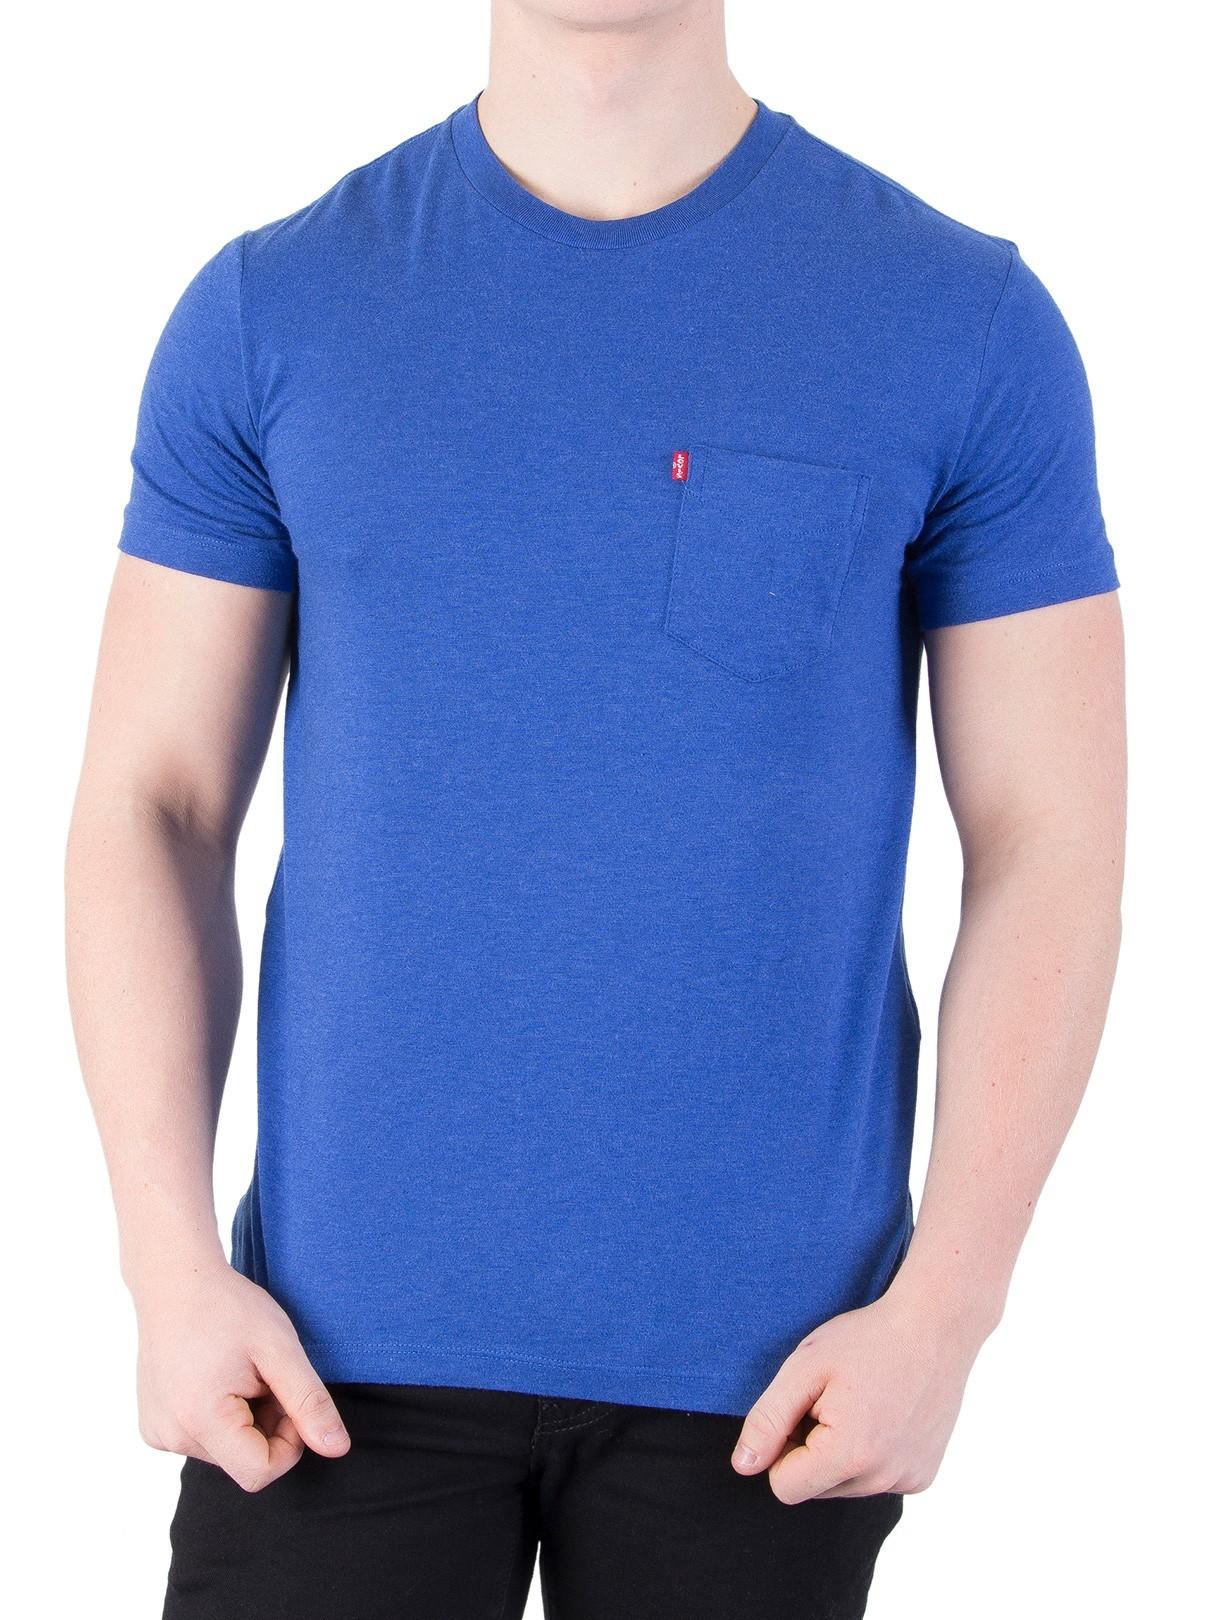 4663f0c67a38 Levi s True Blue Setin Sunset Pocket T-Shirt